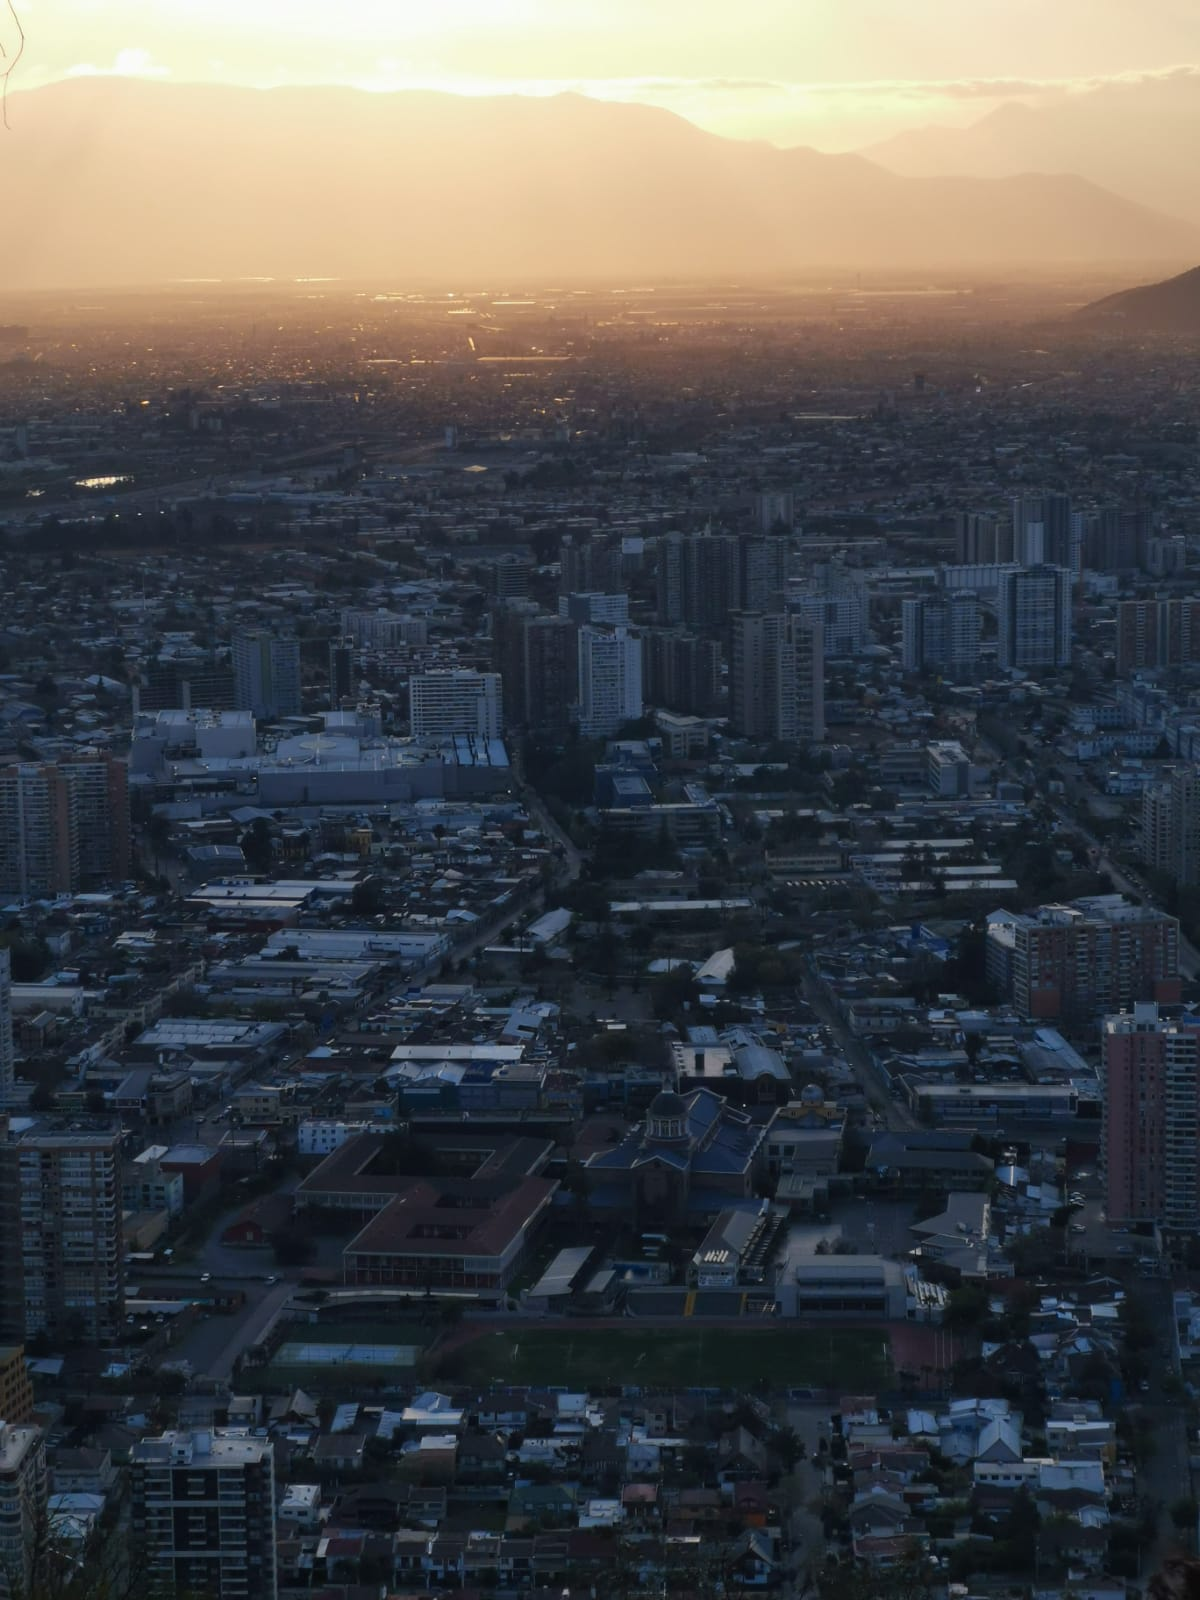 viaggio fotografico atacama tramonto cile